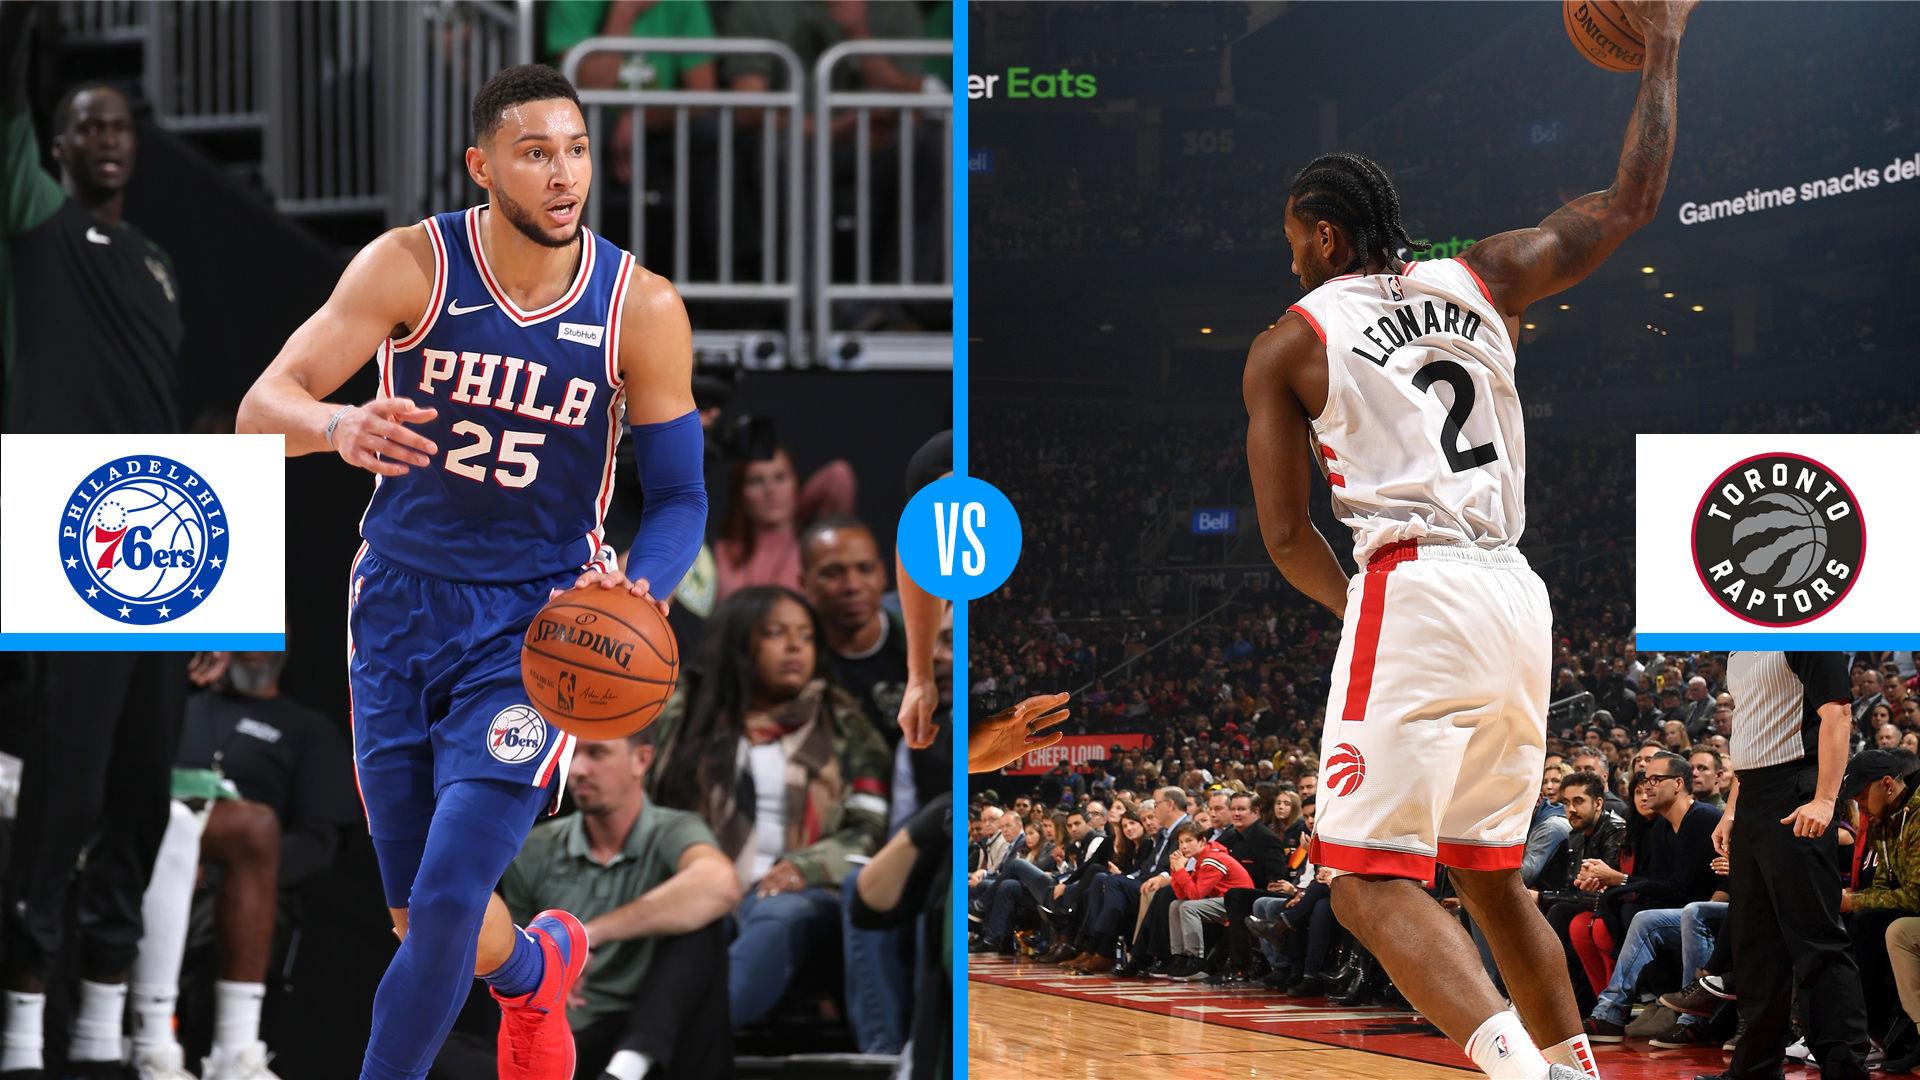 Toronto Raptors vs. Philadelphia 76ers: Game preview, live stream, TV channel, start time   NBA.com